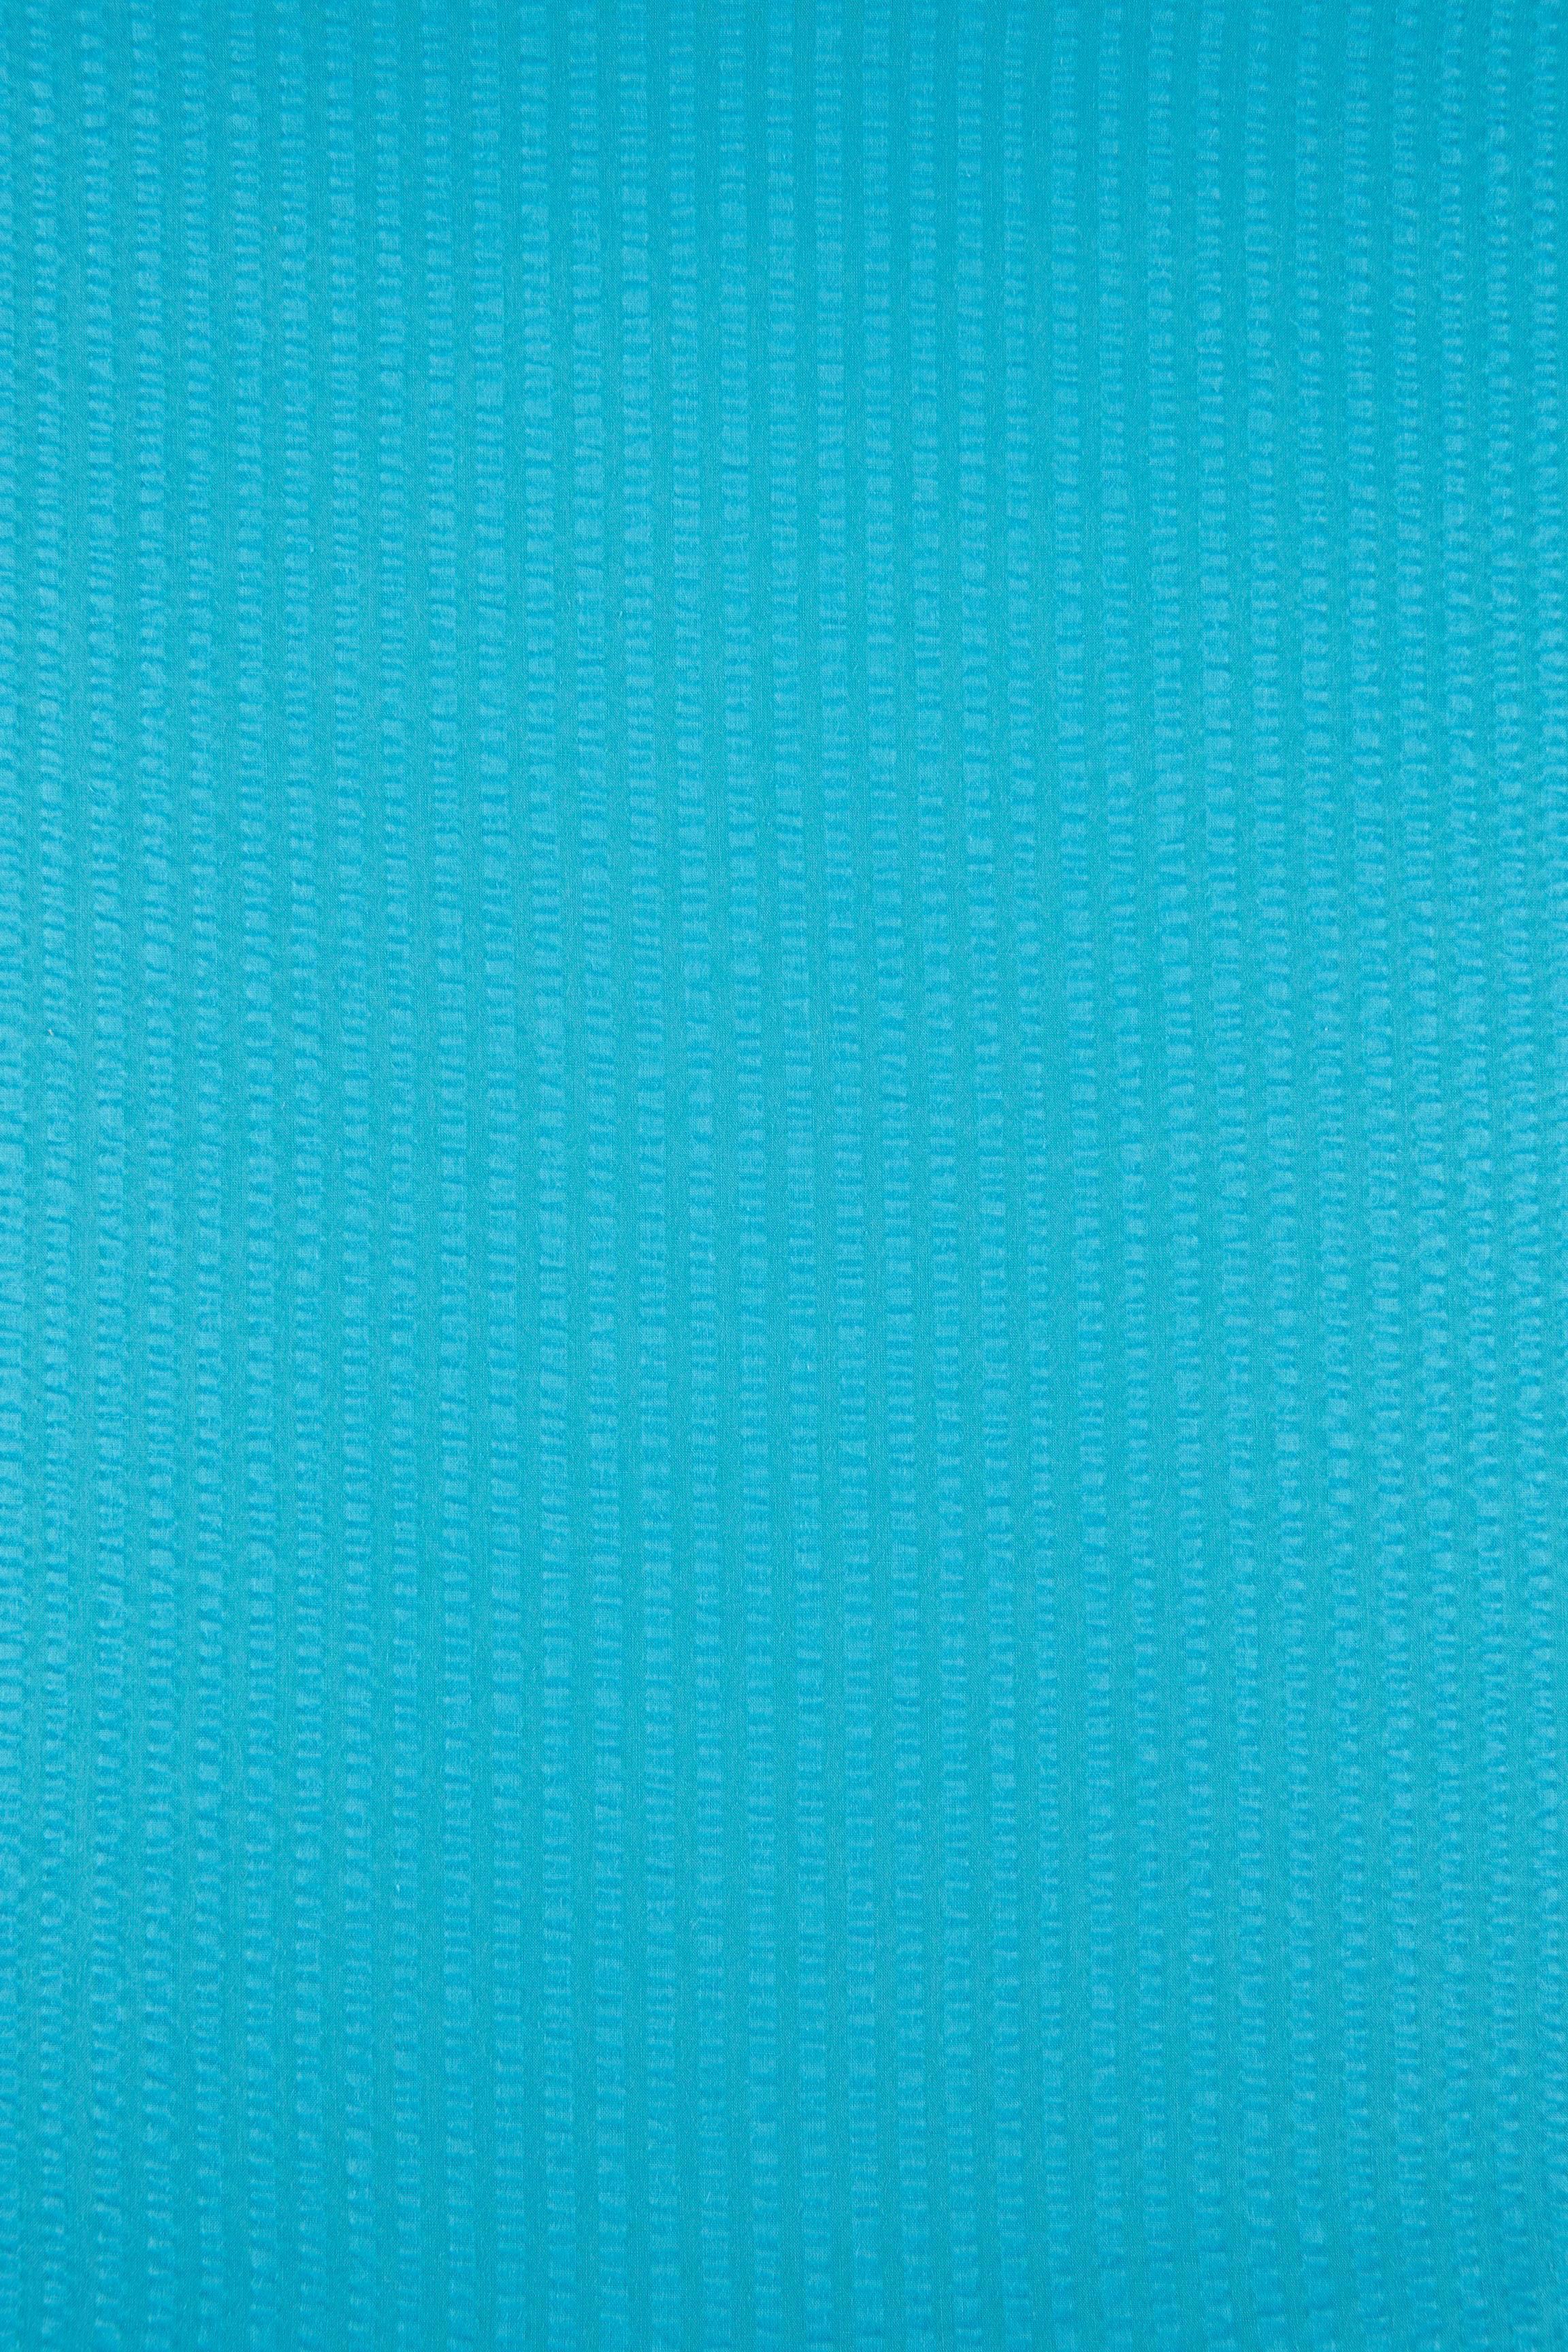 Bettwäsche Babylon ca. 140x200cm - Türkis, Textil (135/200cm) - MÖMAX modern living